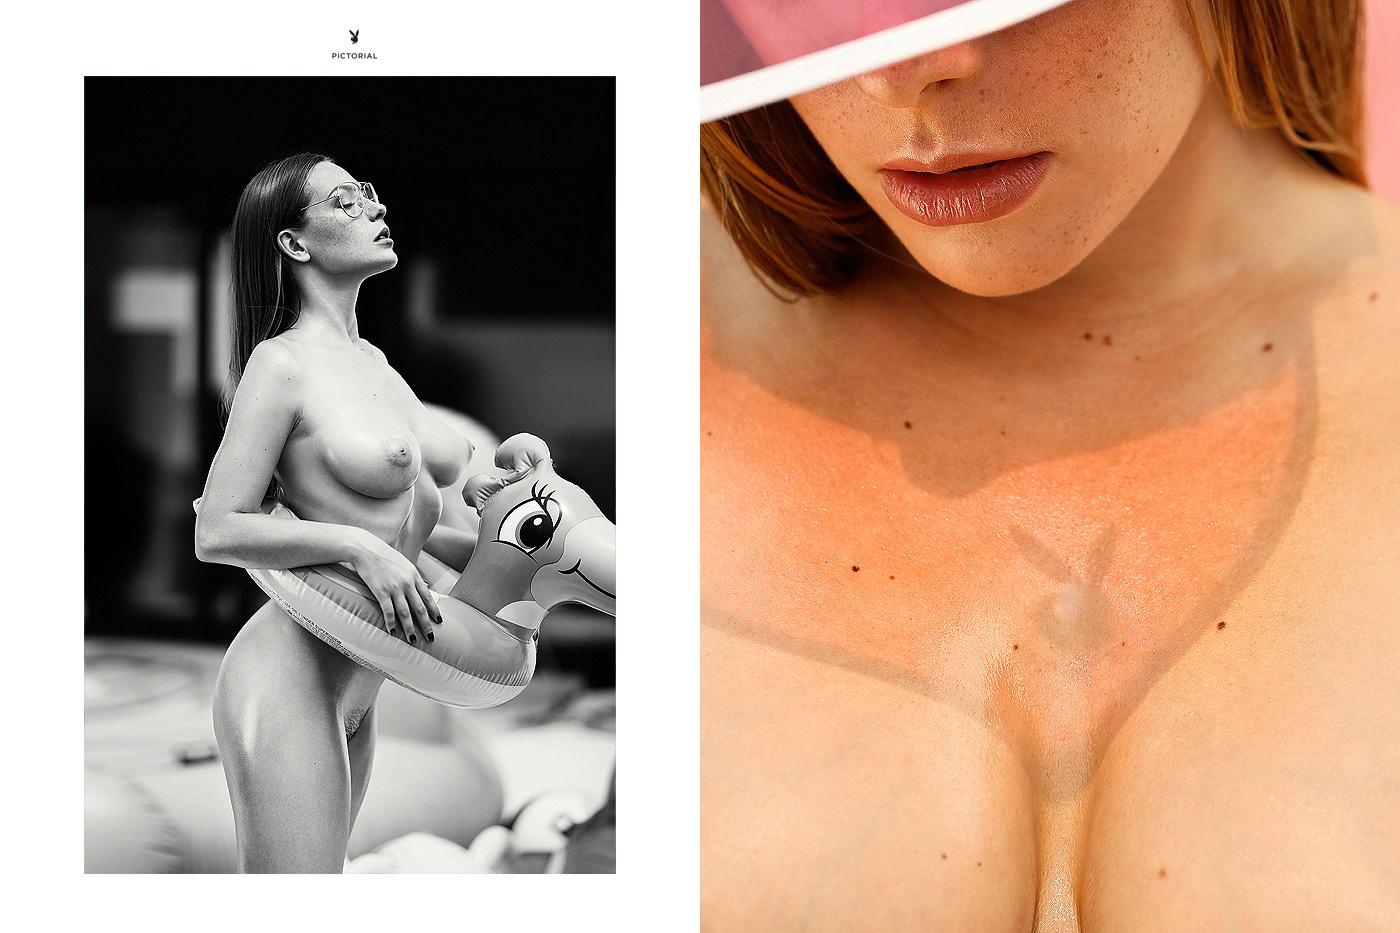 Ольга Кобзар - Playboy Netherlands February 2018 / фото Ana Dias